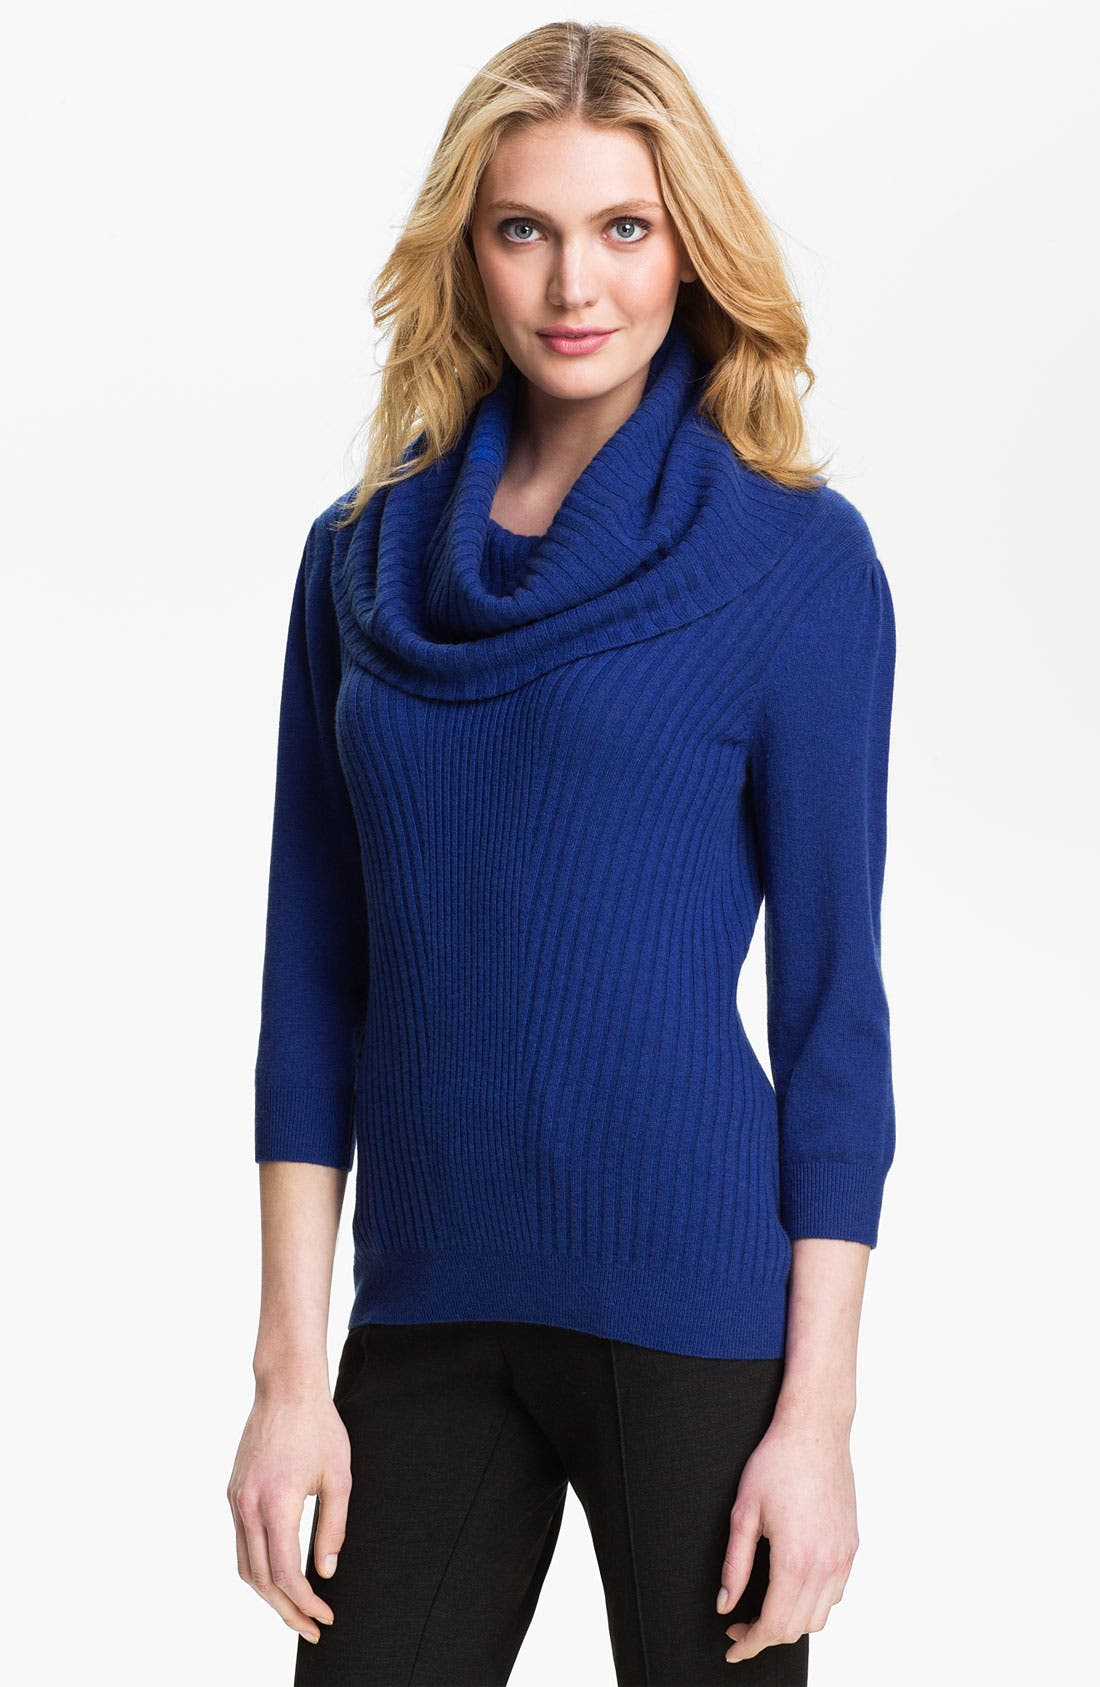 Alternate Image 1 Selected - Classiques Entier® Cowl Neck Cashmere Sweater